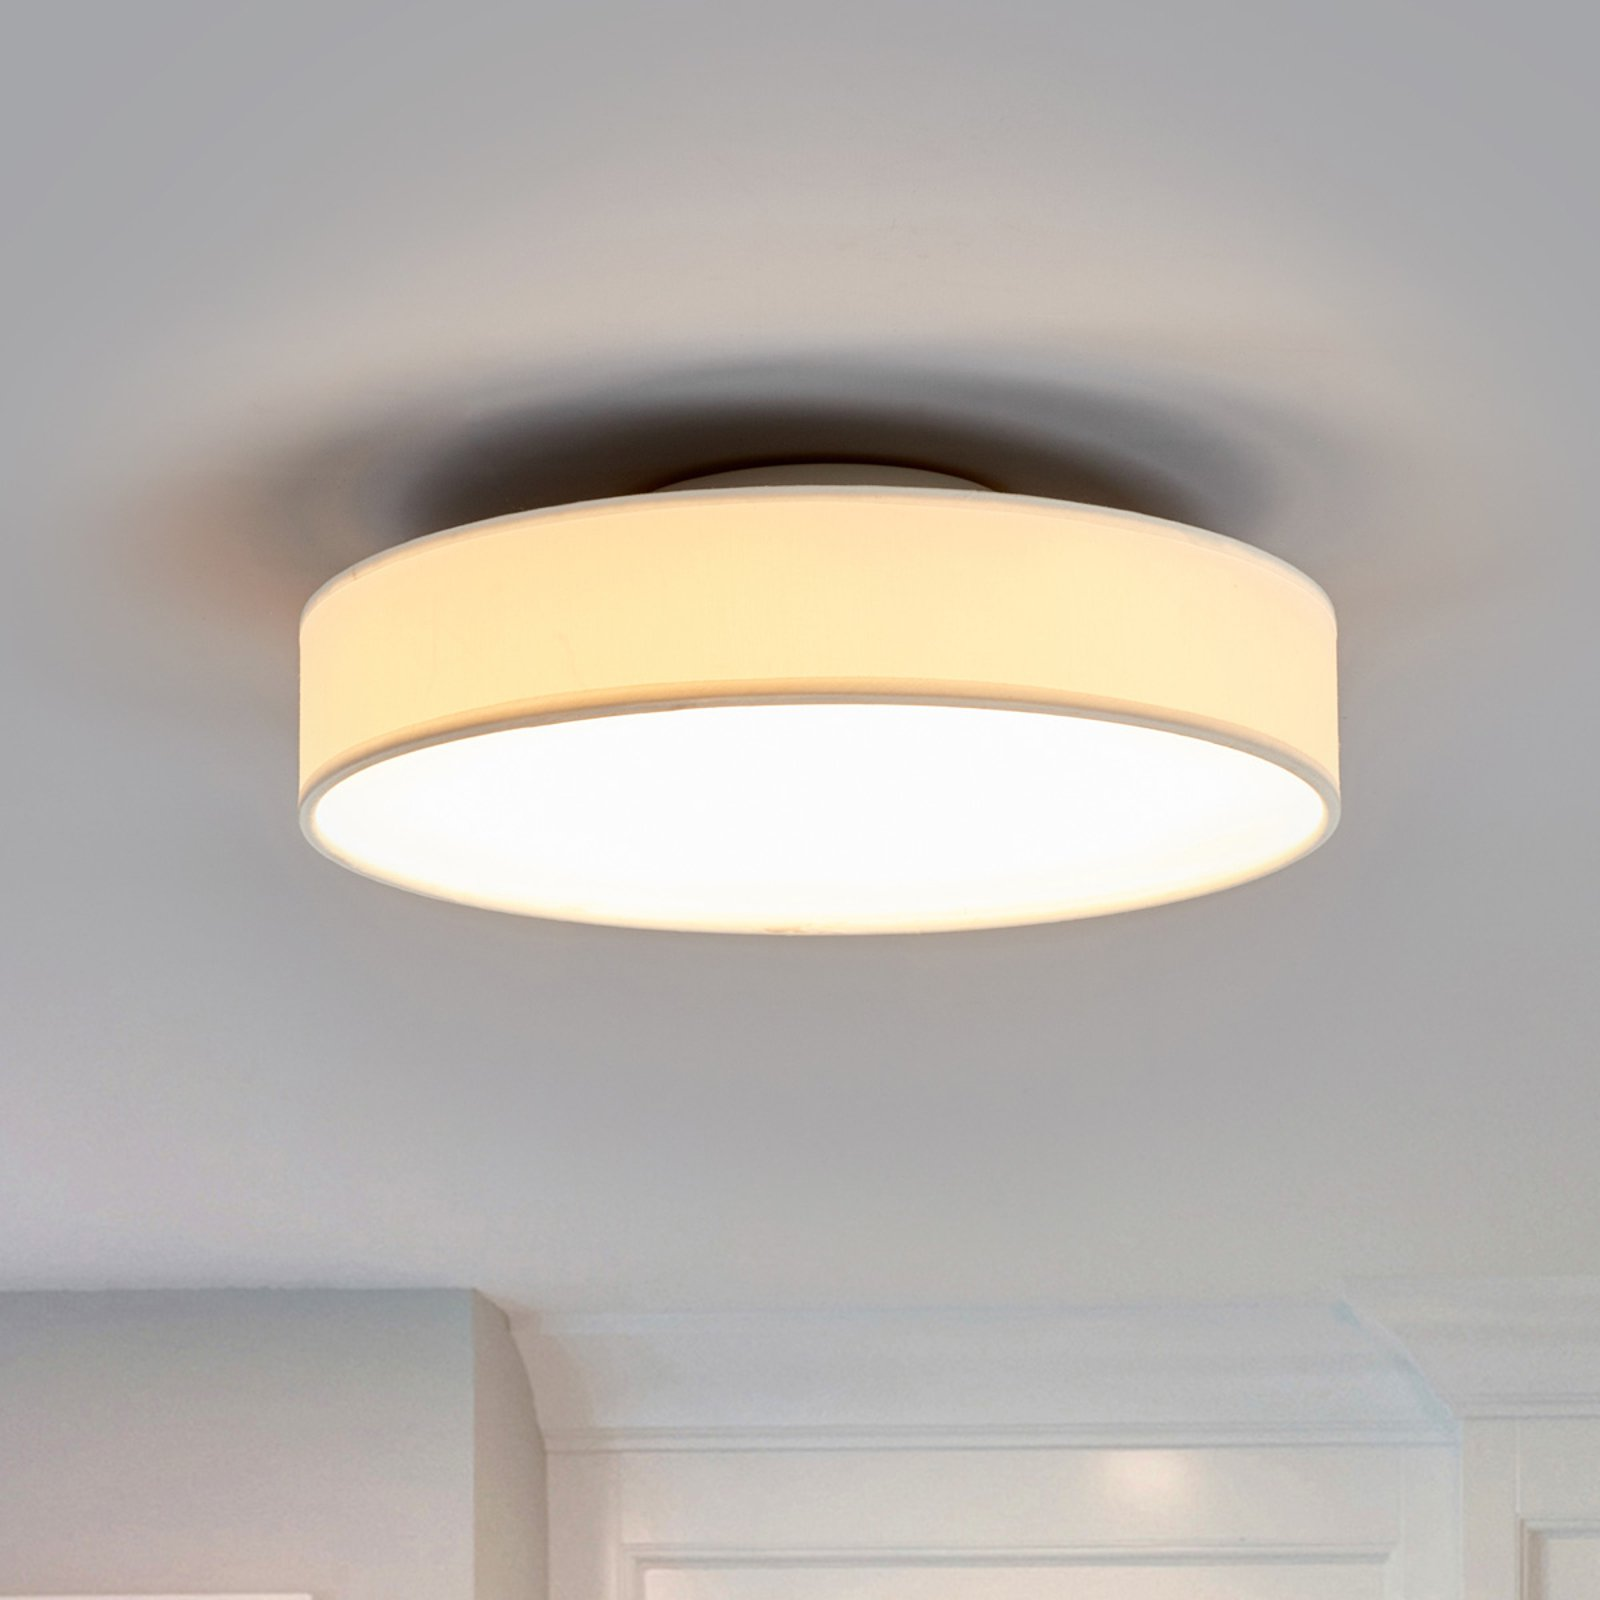 LED-stoff-taklampe Saira, 30 cm, hvit